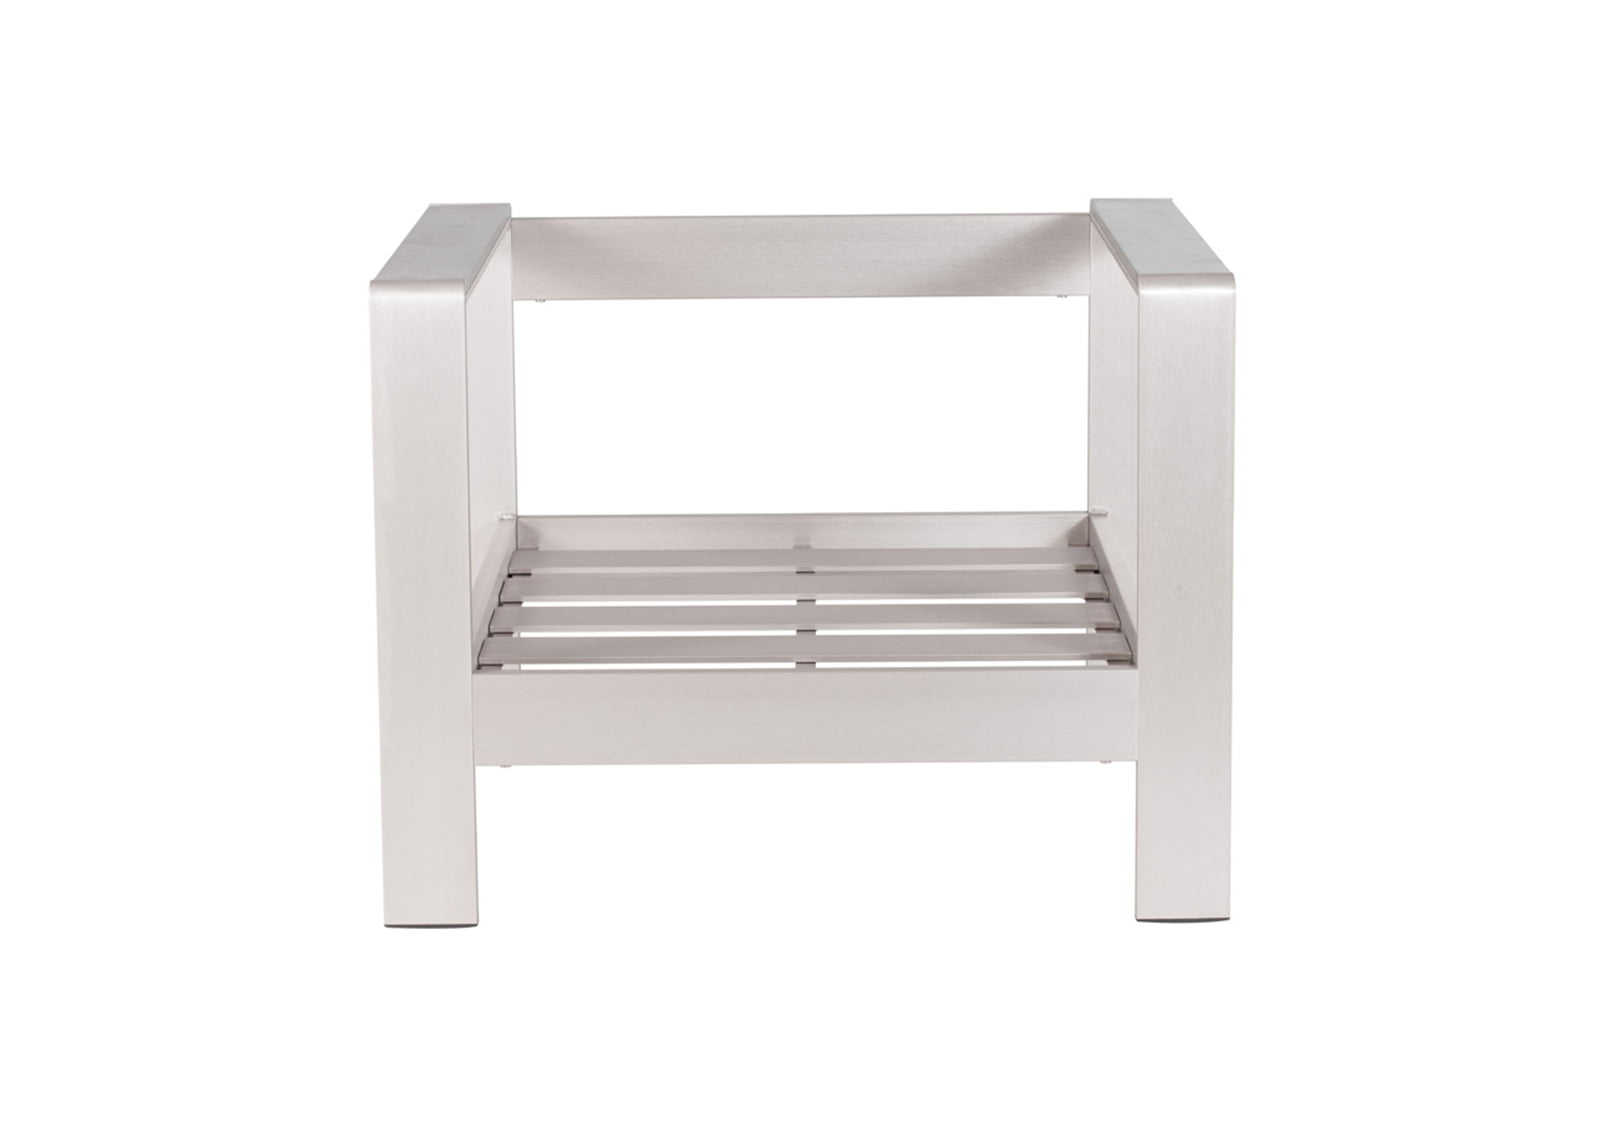 brushed aluminum chairs chair cover elegance le mars iowa cosmopolitan arm frame furnishplus